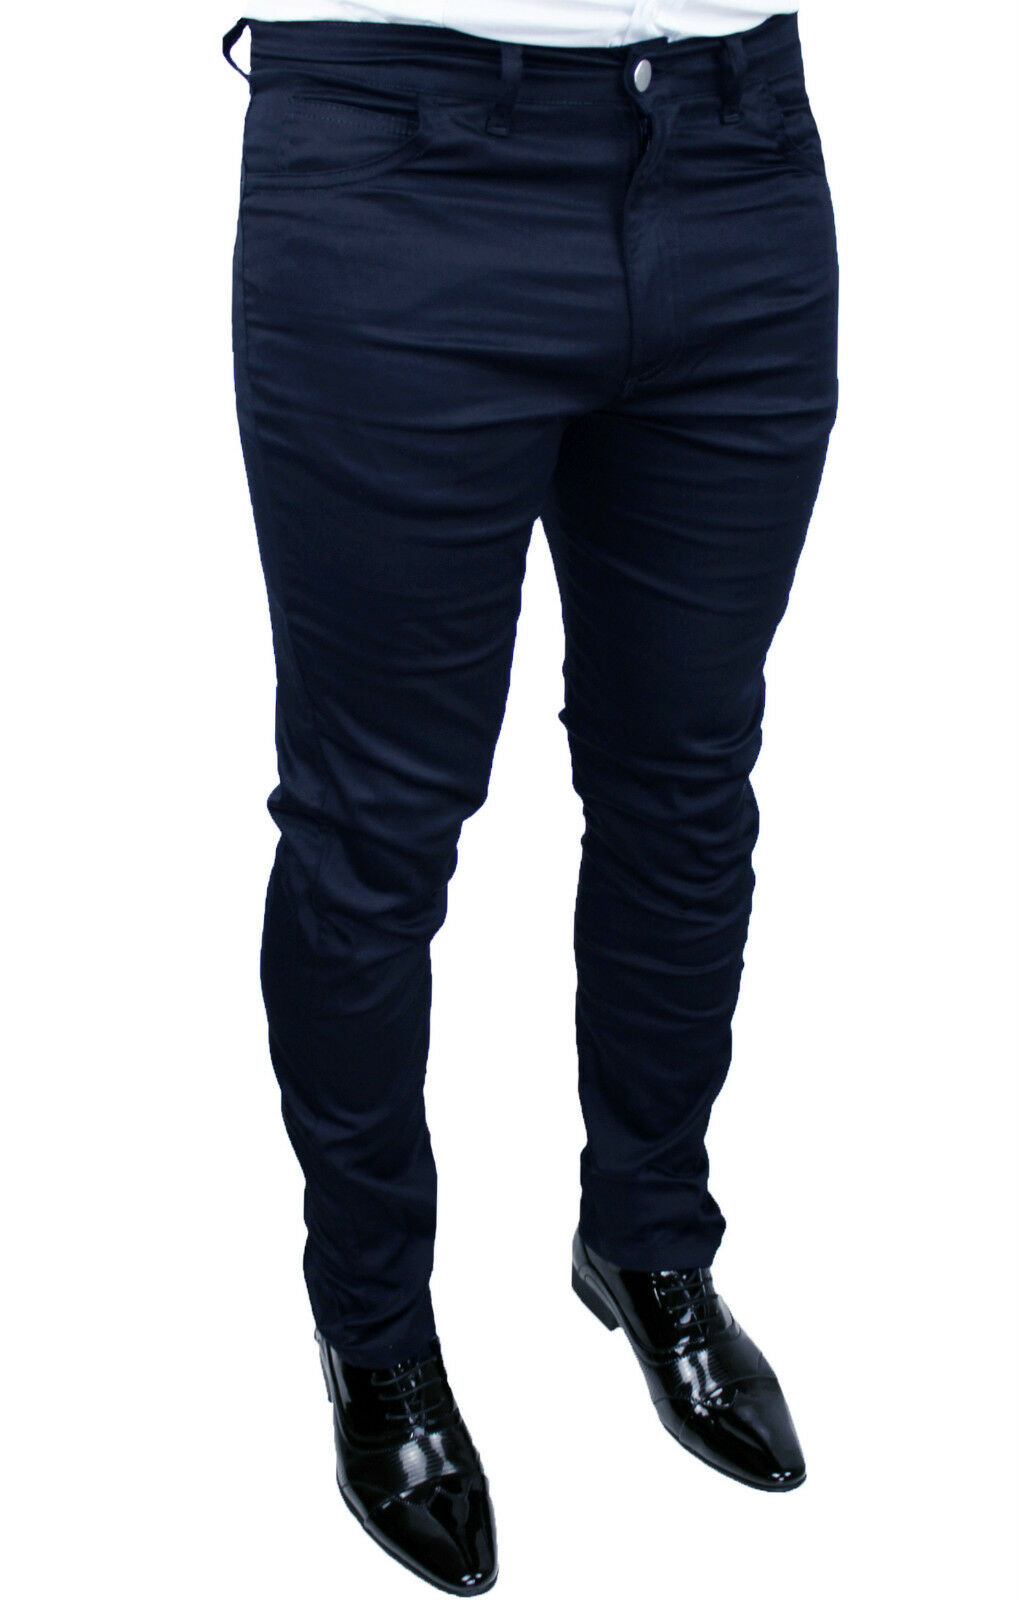 Battistini 48 46 56 54 Cotone Uomo Blu 52 Taglia Pantalone Jeans 50 0xPB5Yqnw